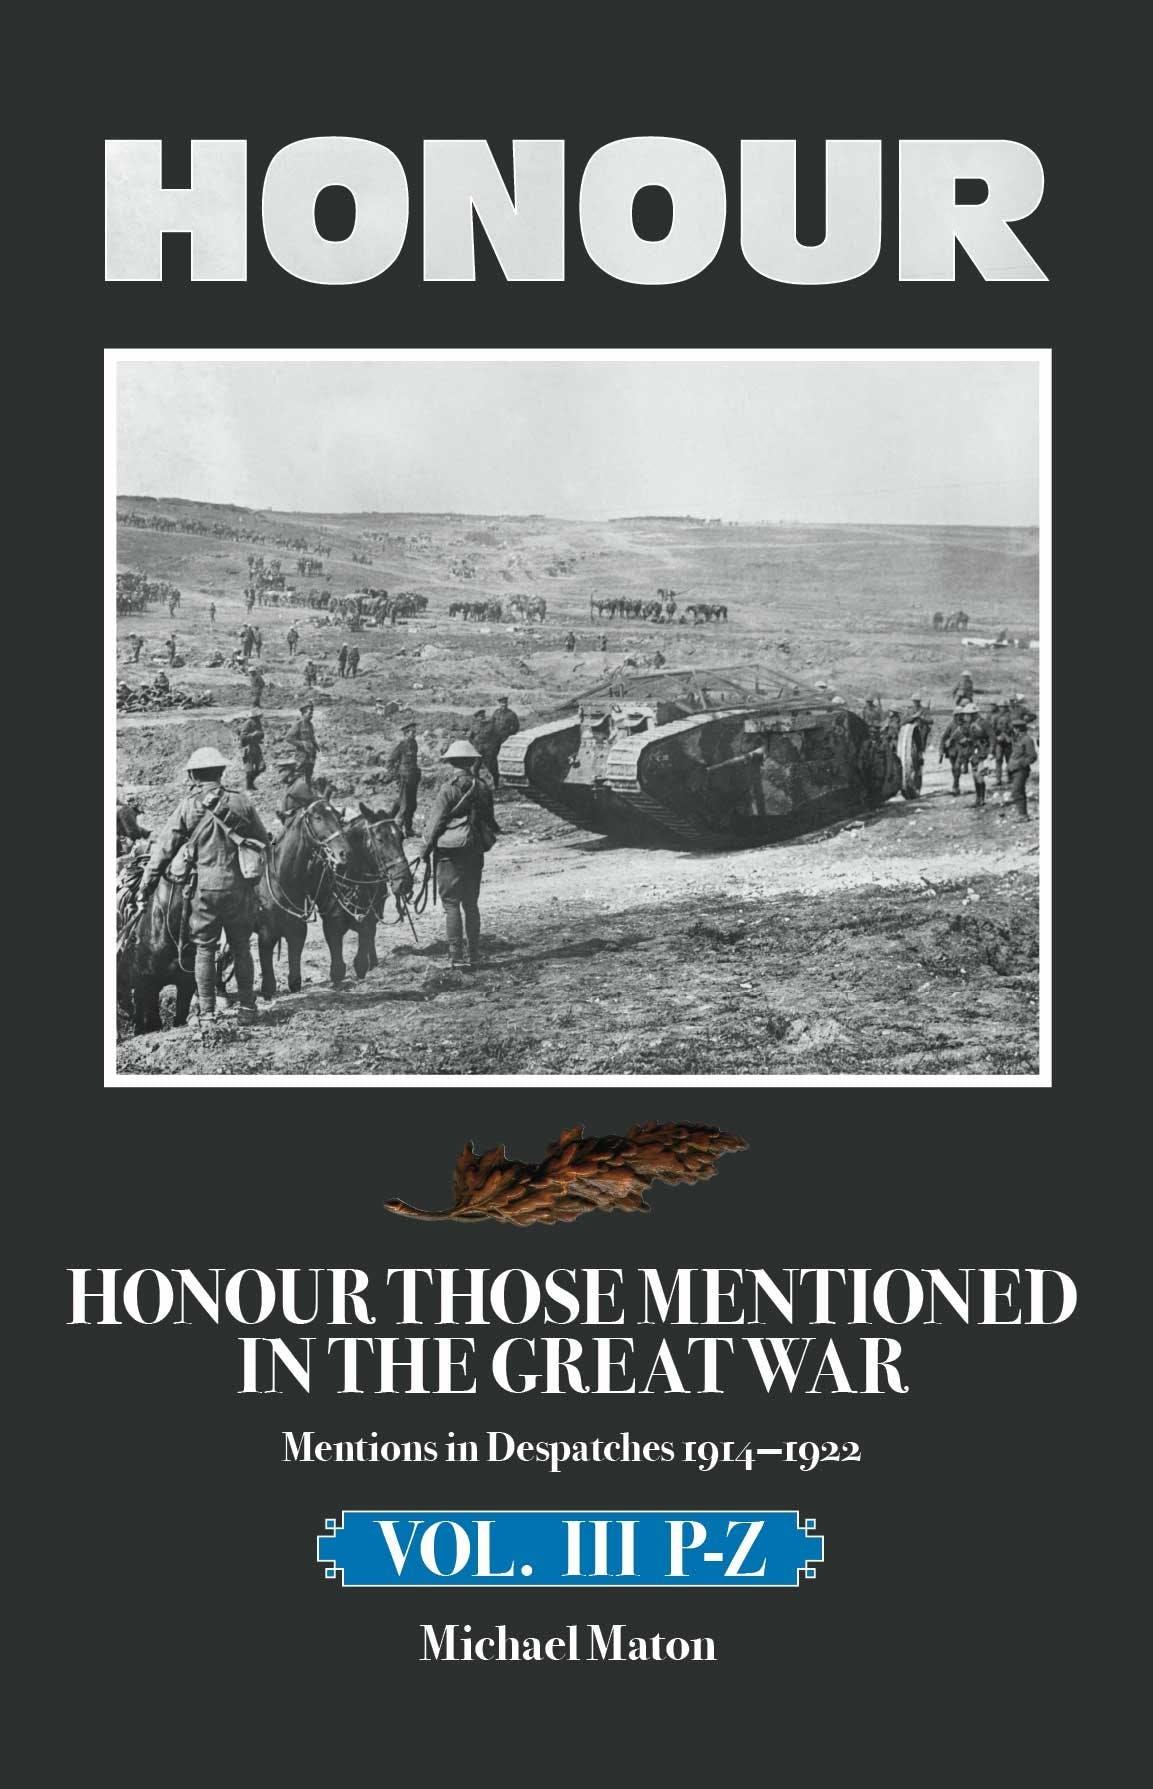 World War I MiDs Volume III in the Token Publishing Shop